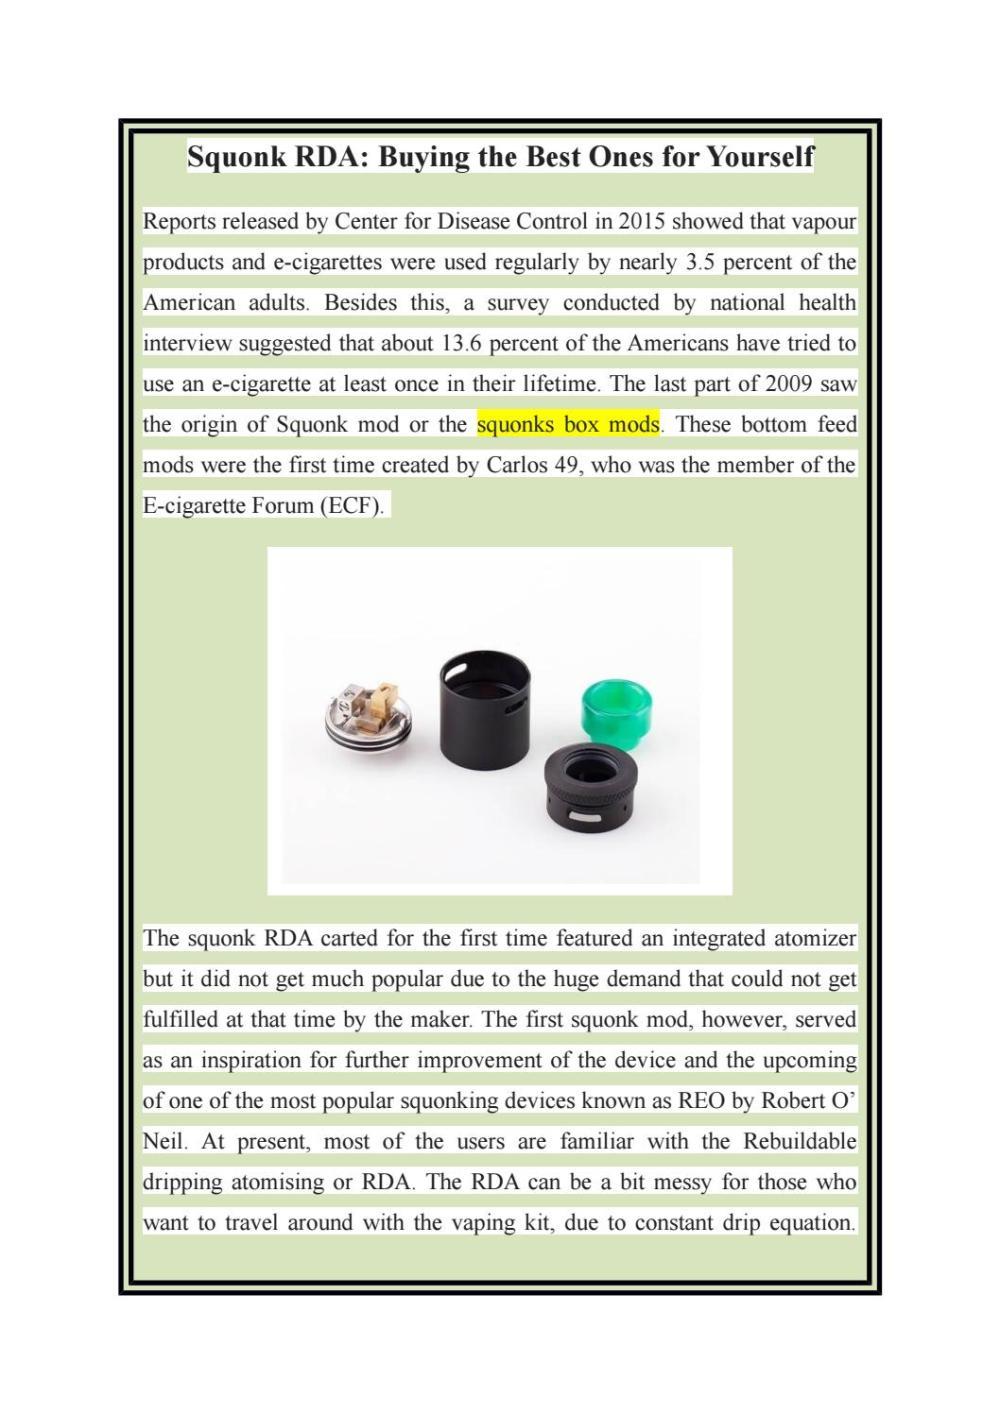 medium resolution of best squonk rdas bottom feeding rdas that make squonking better from vape monarch